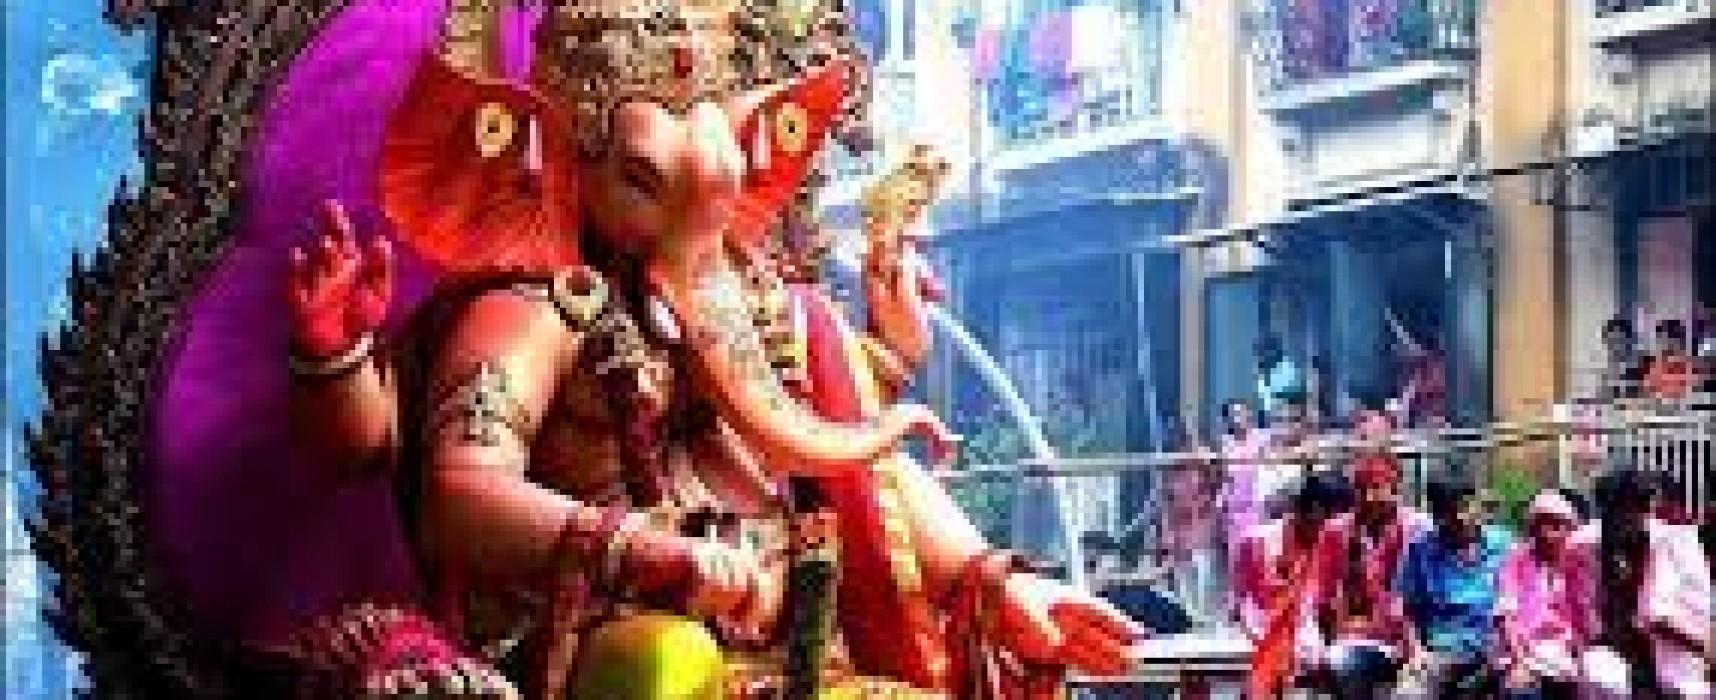 Ganesha Chaturthi : festive season that lasts for 10 days